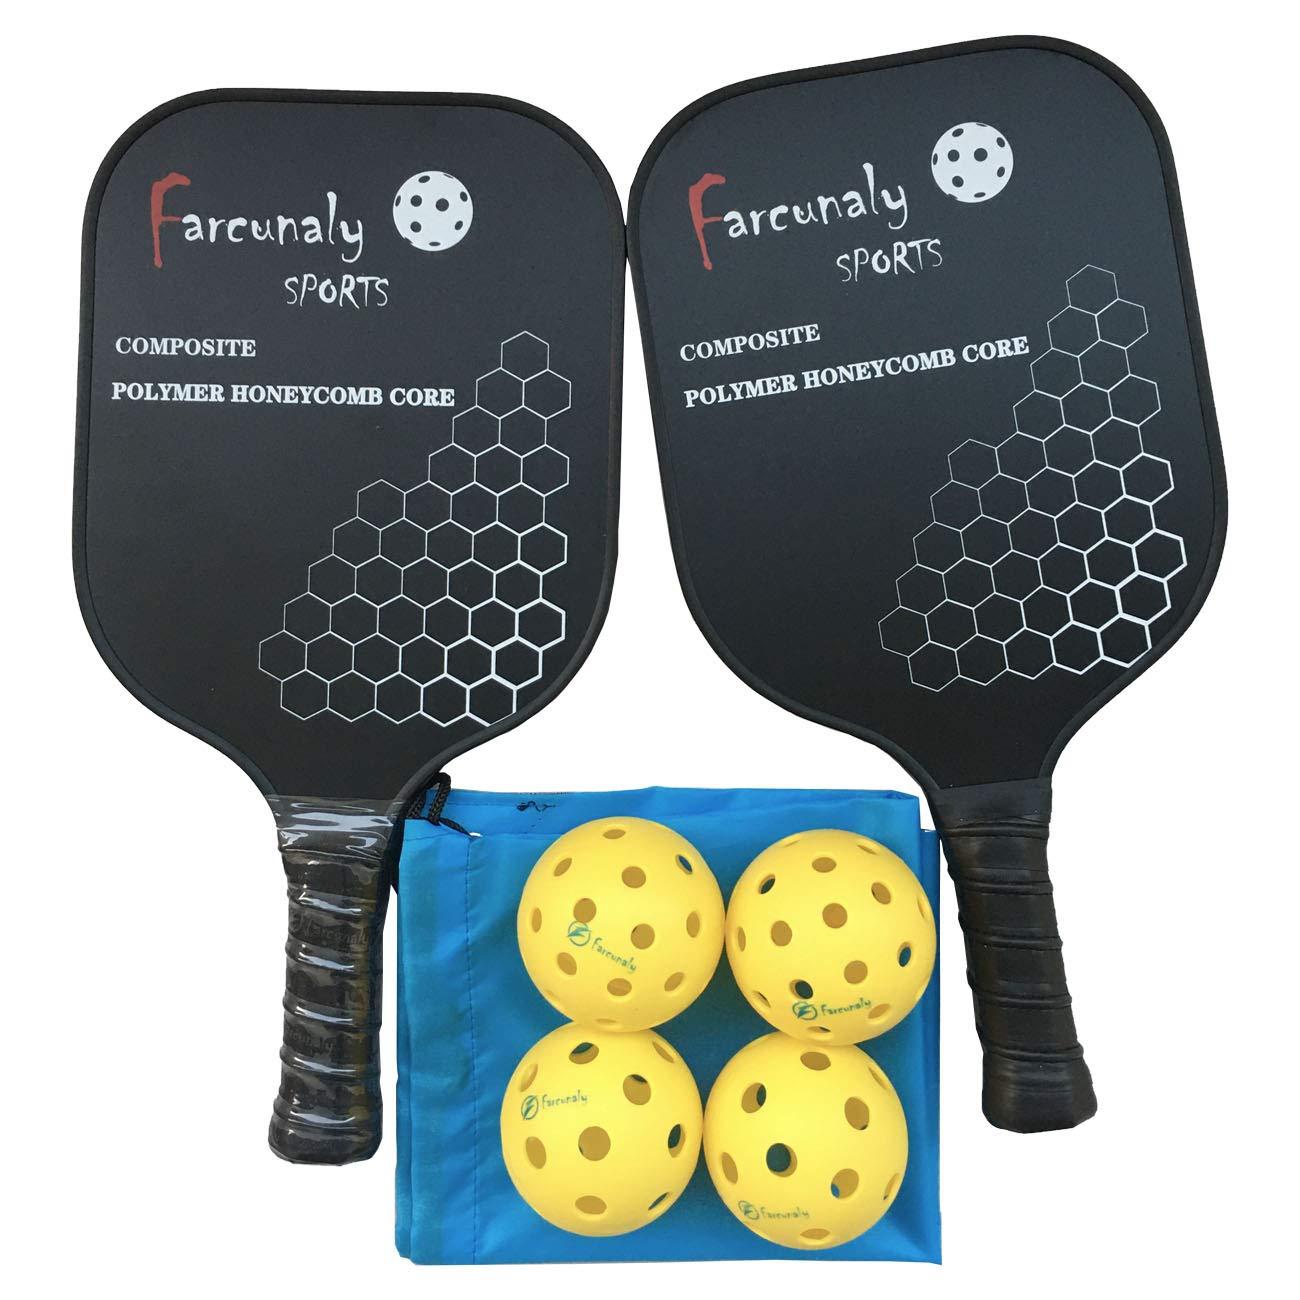 Farcunaly Pickleball Paddle Set Light Weight Power Honeycomb